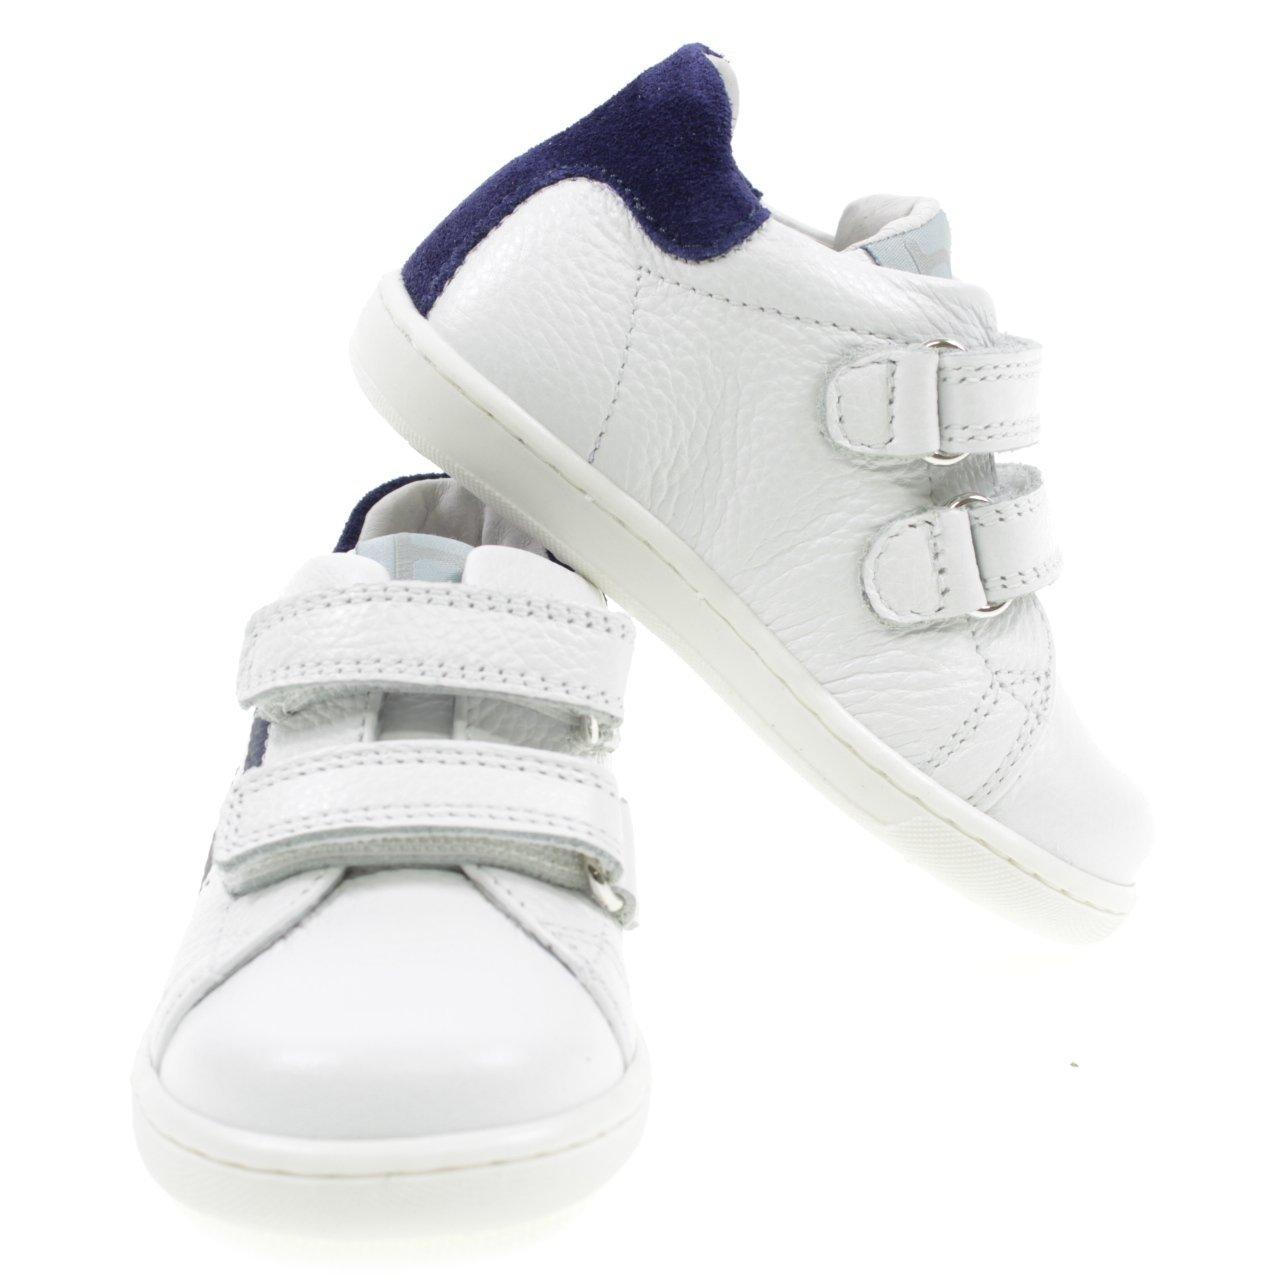 BALDUCCI Scarpe Baby Sneakers in Pelle Bianco CITA1031-BIANCO   Amazon.co.uk  Shoes   Bags 8029b14c8fa